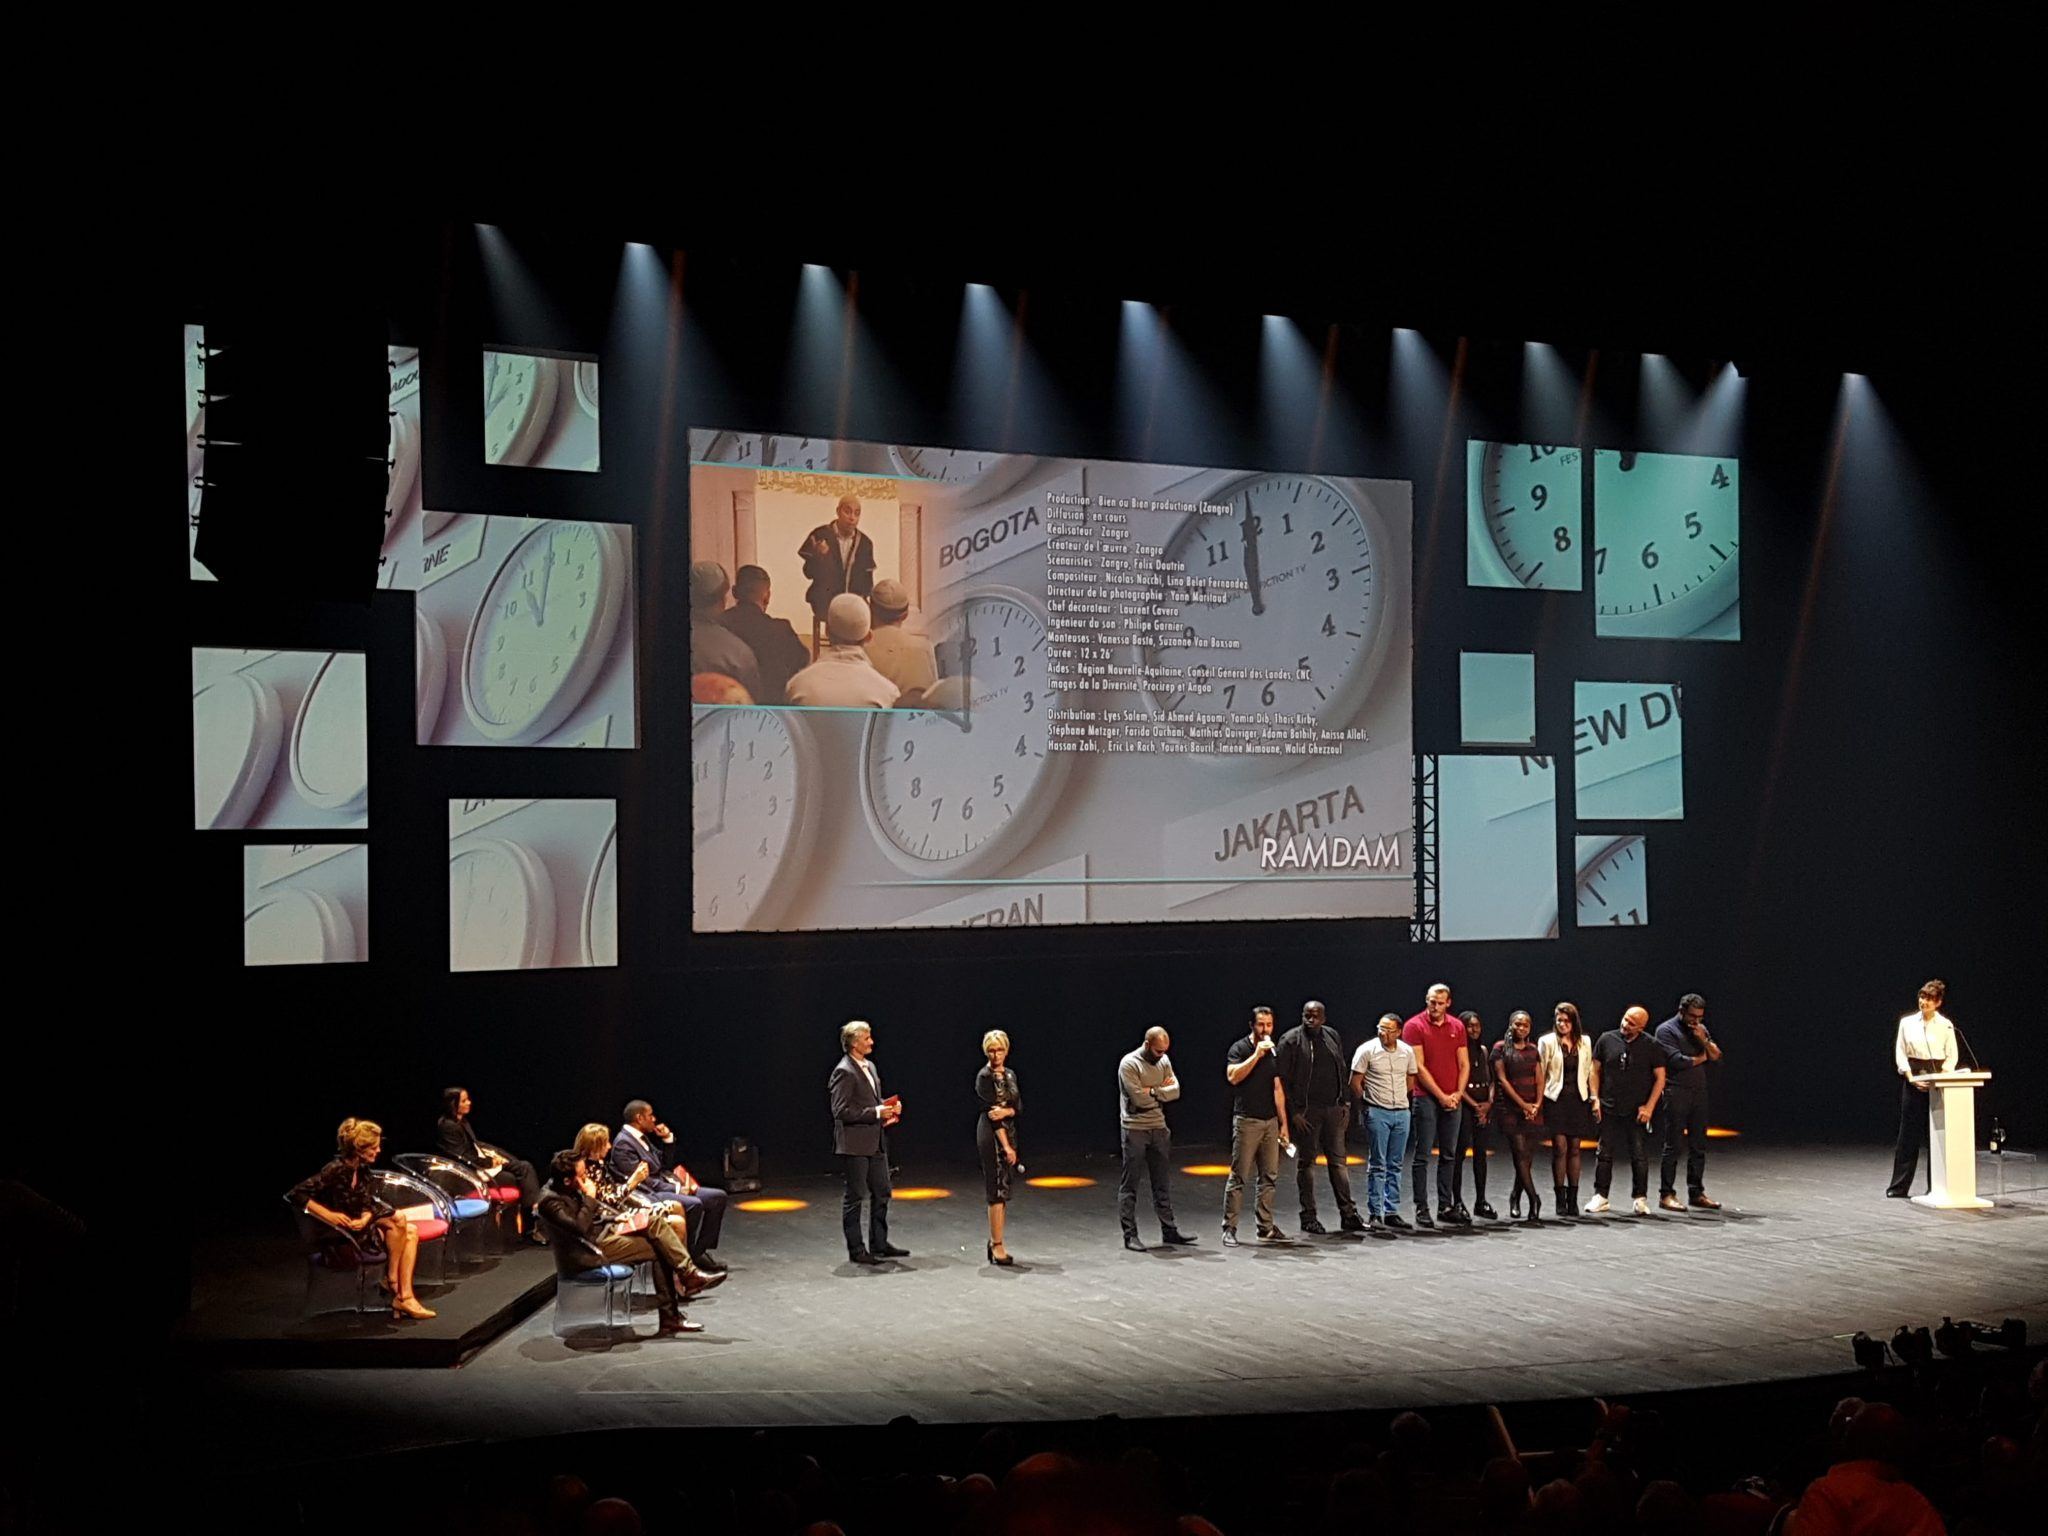 festival de la fiction tv de la rochelle 2017 image Ramdam